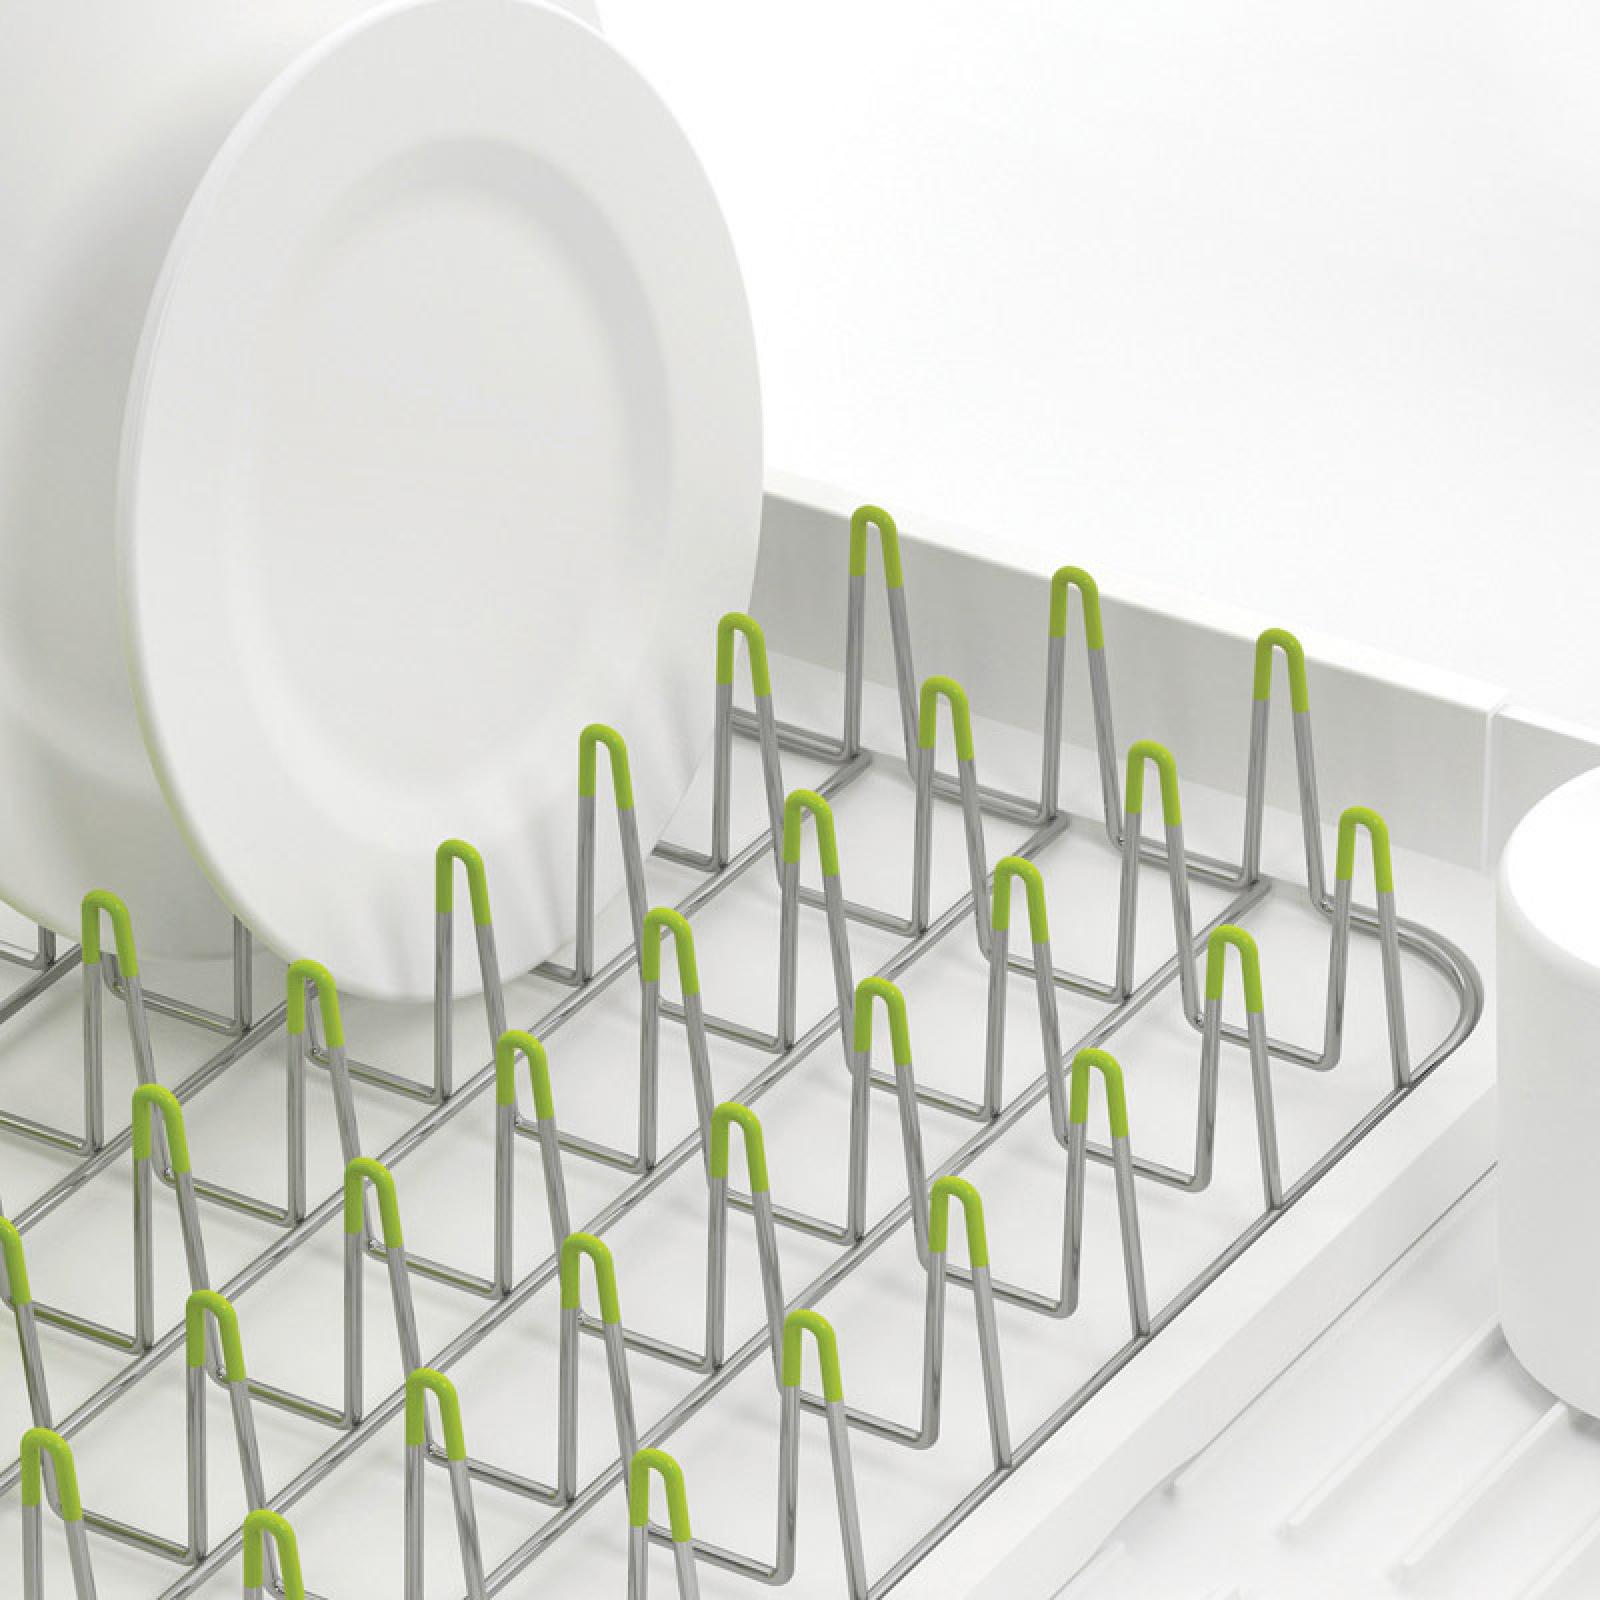 Сушилка для посуды раздвижная Joseph Joseph extend, 32х16х36 см, белый Joseph Joseph 85071 фото 4